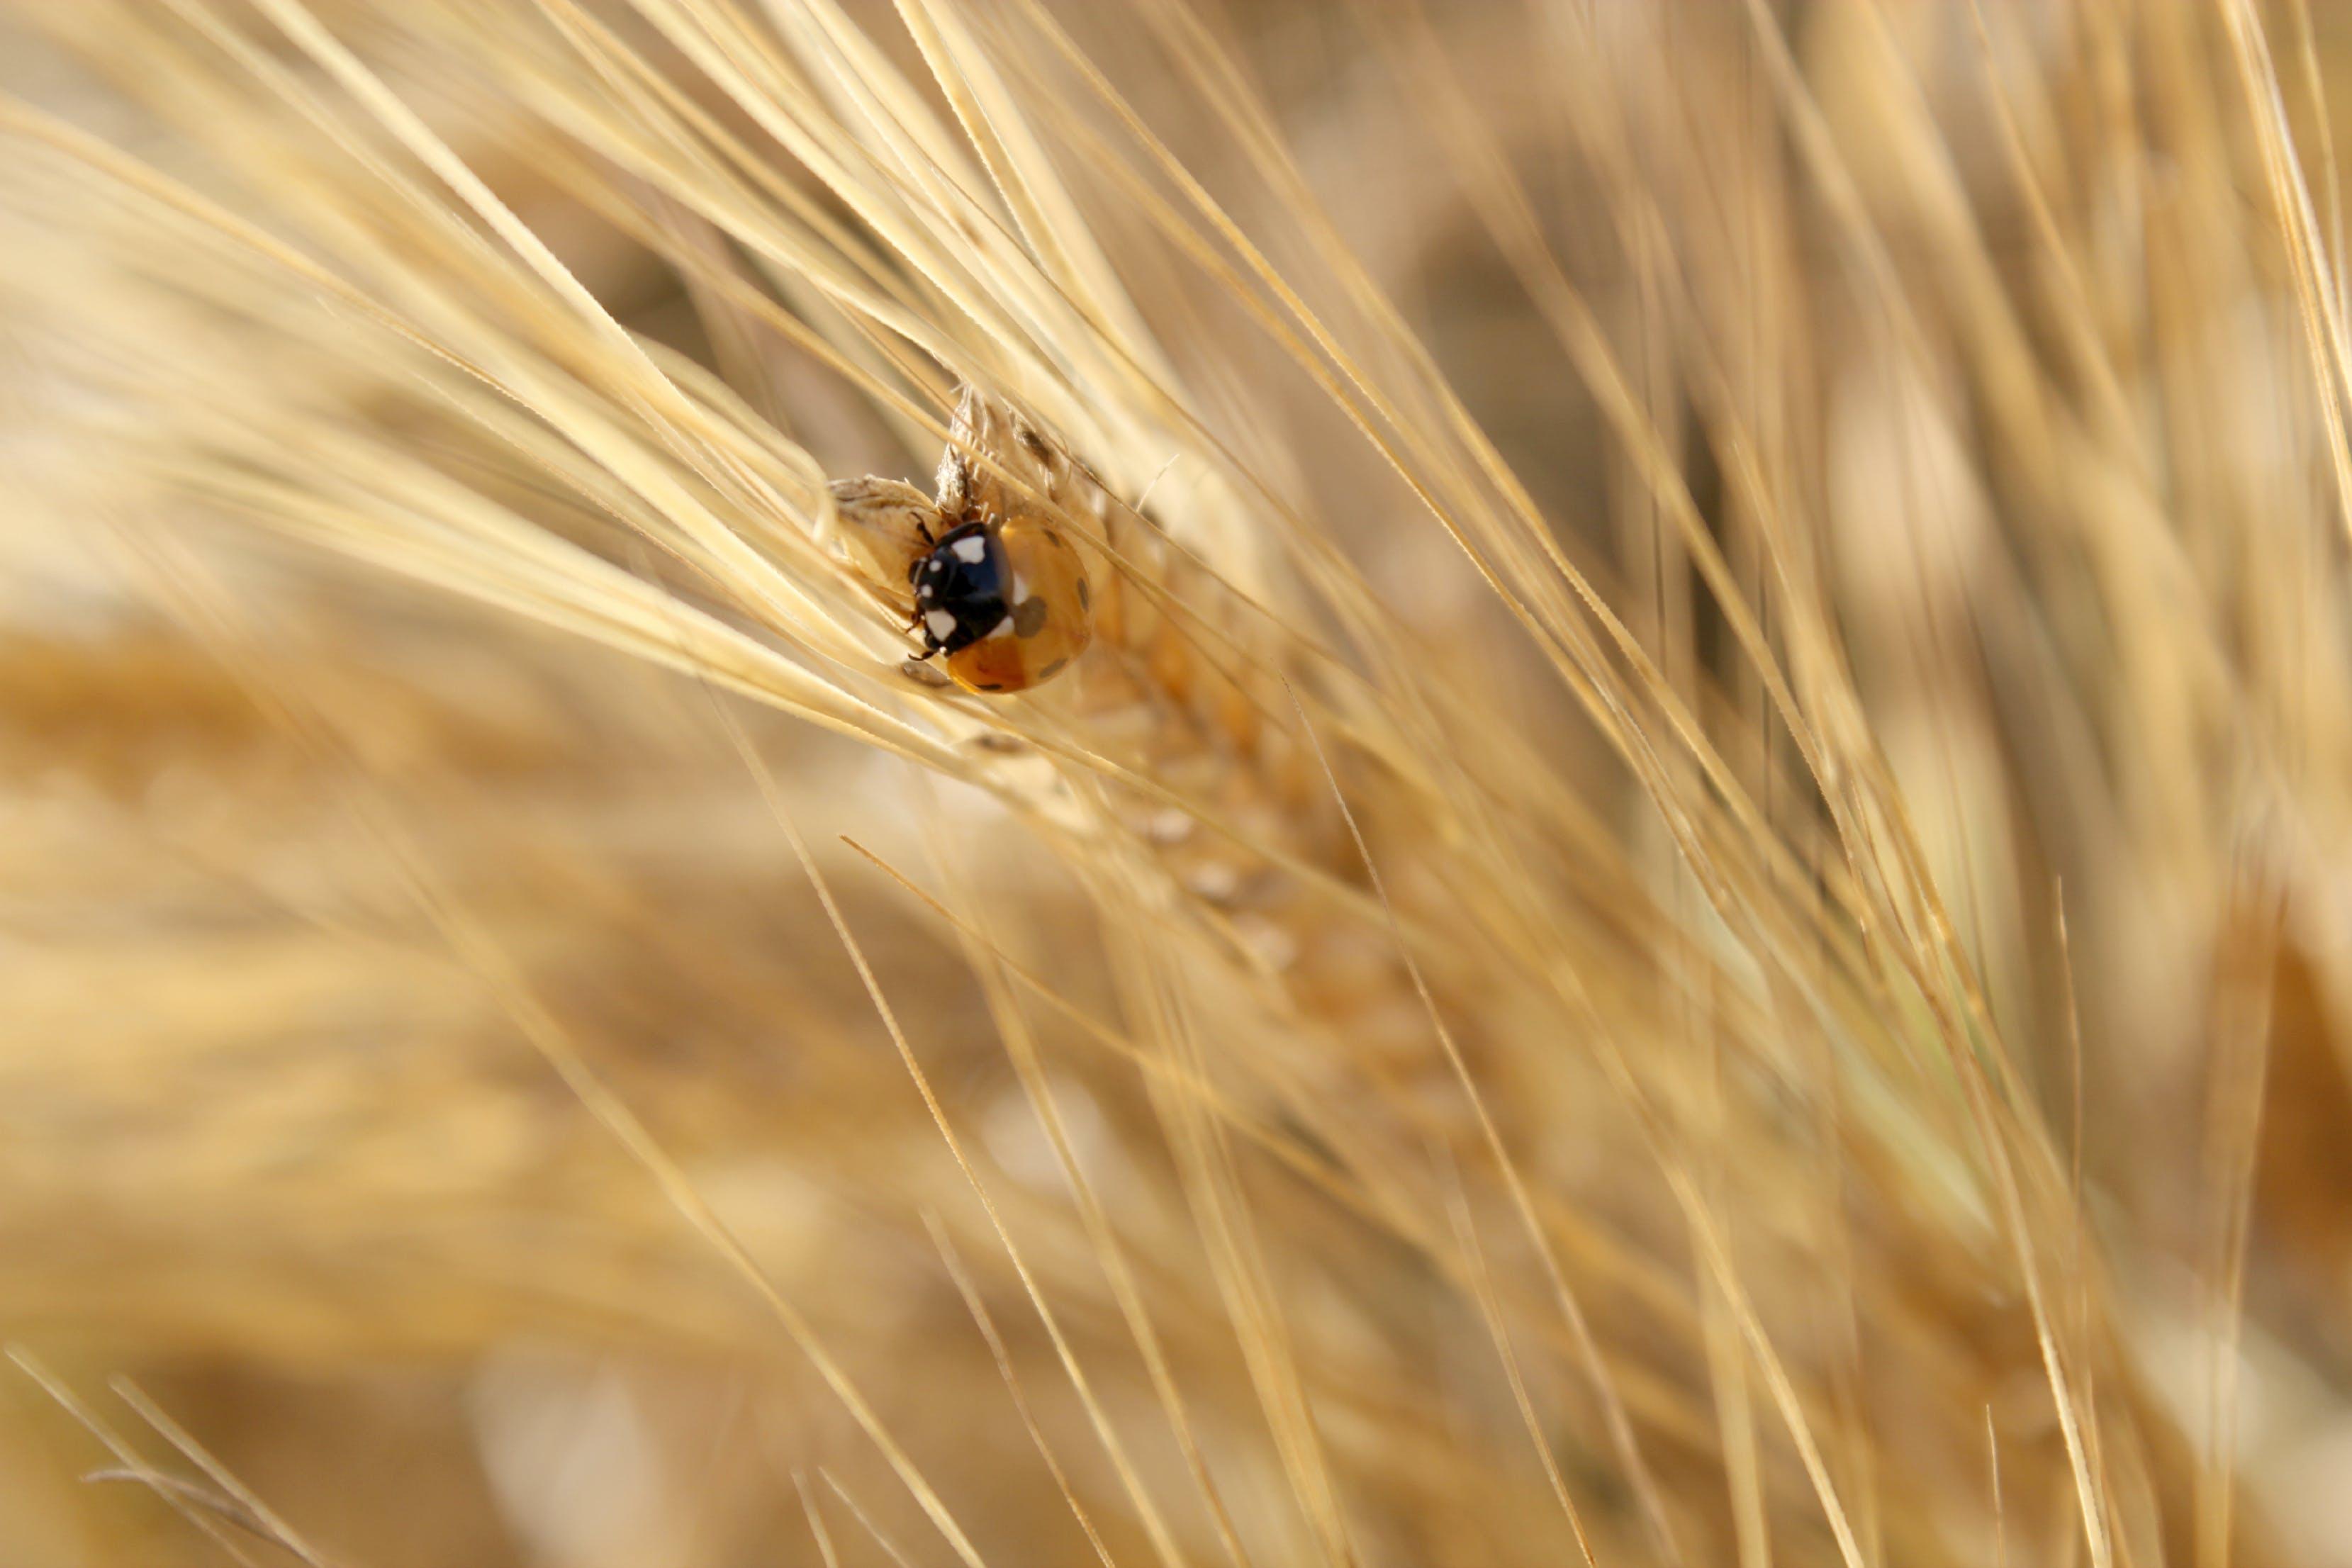 Free stock photo of bug, field, ladybug, macro photo